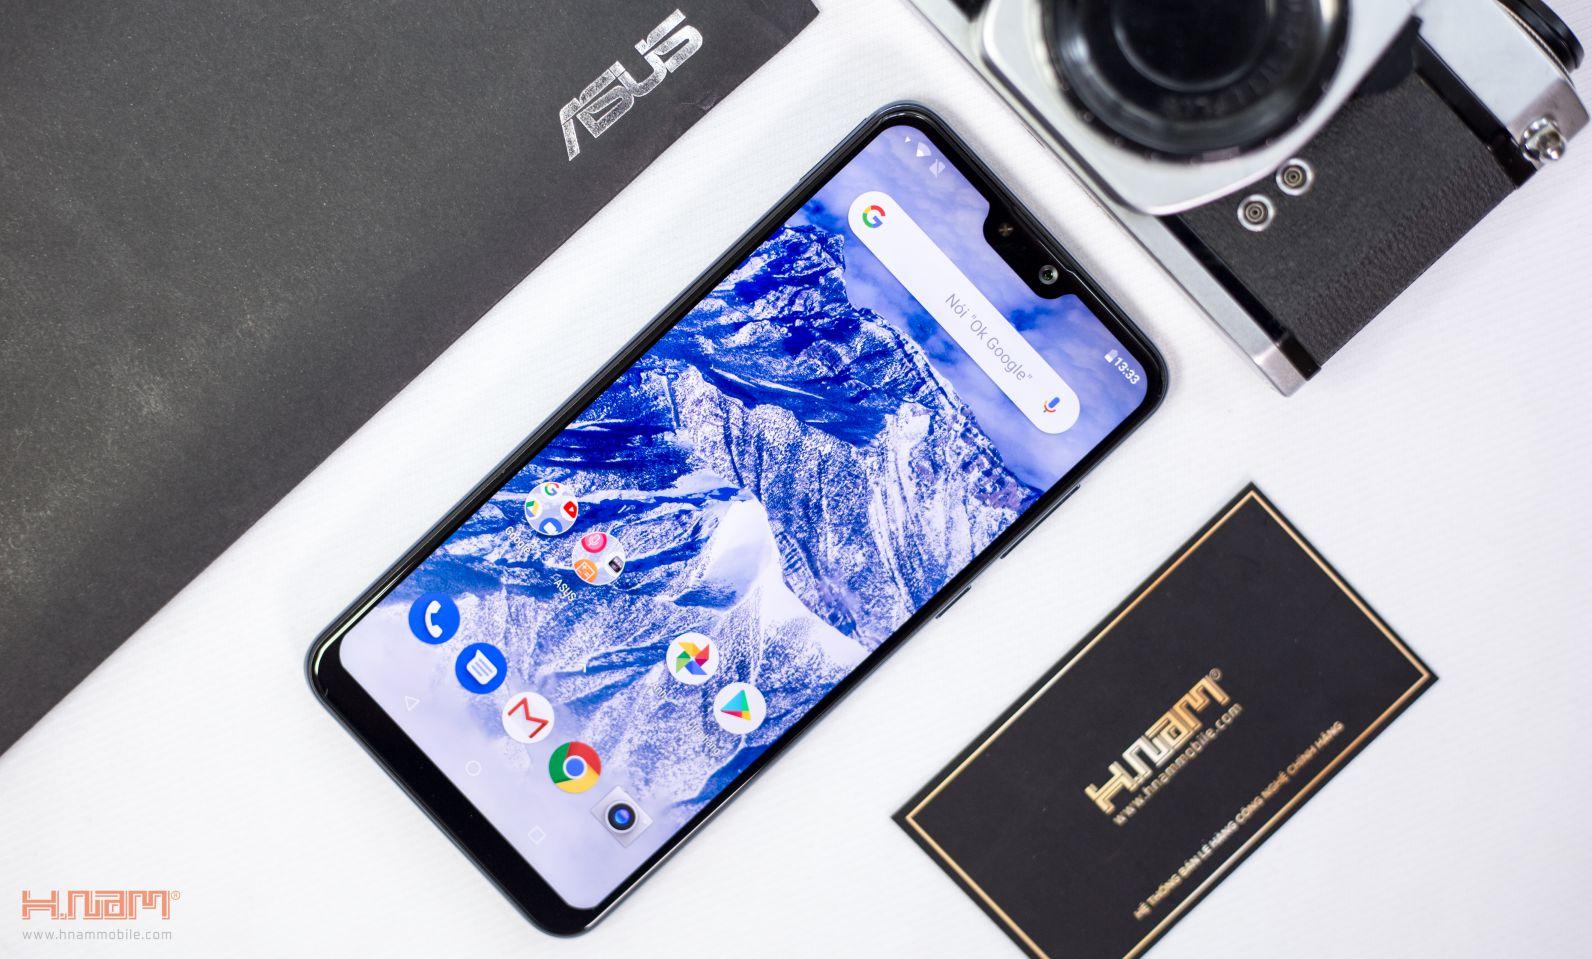 Trên tay Zenfone Max Pro M2: Snapdragon 660, pin 5000mAh, 5.29 triệu hình 8